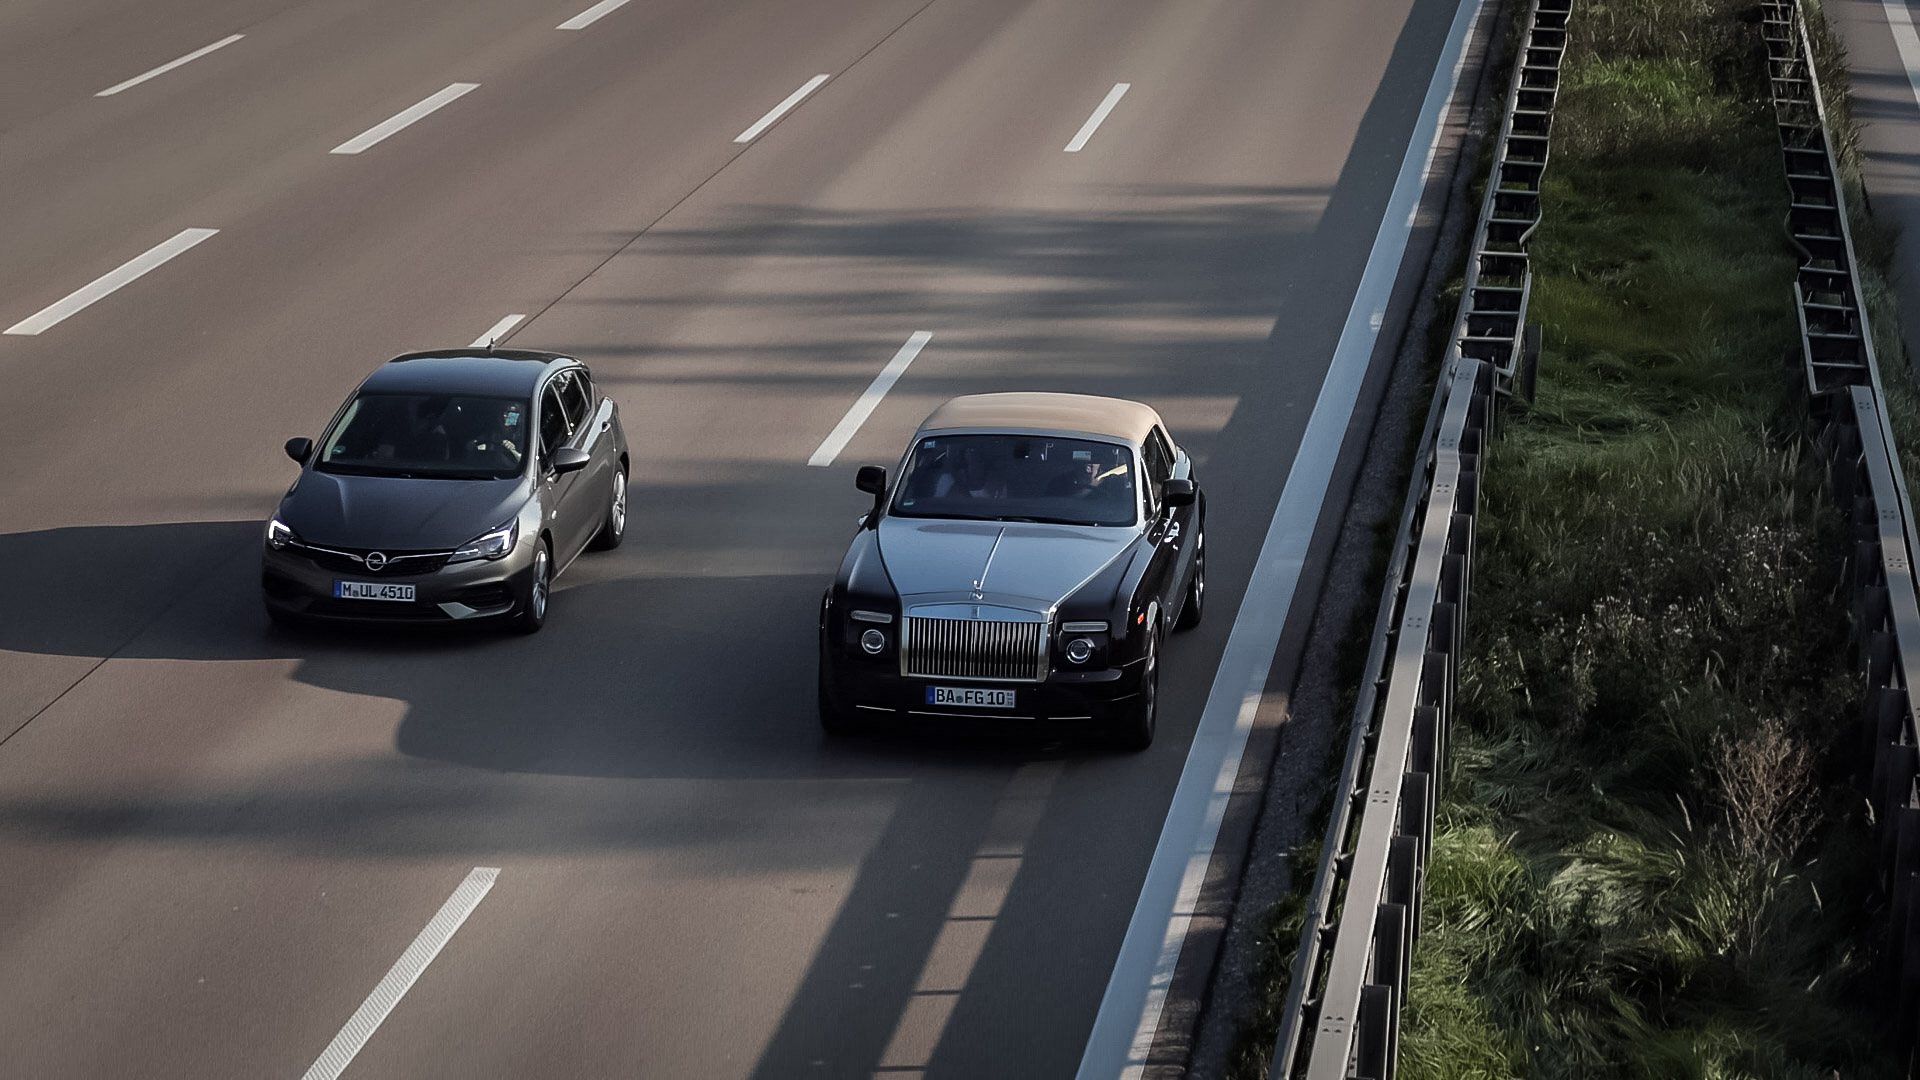 Rolls Royce Drophead - BA-FG-10